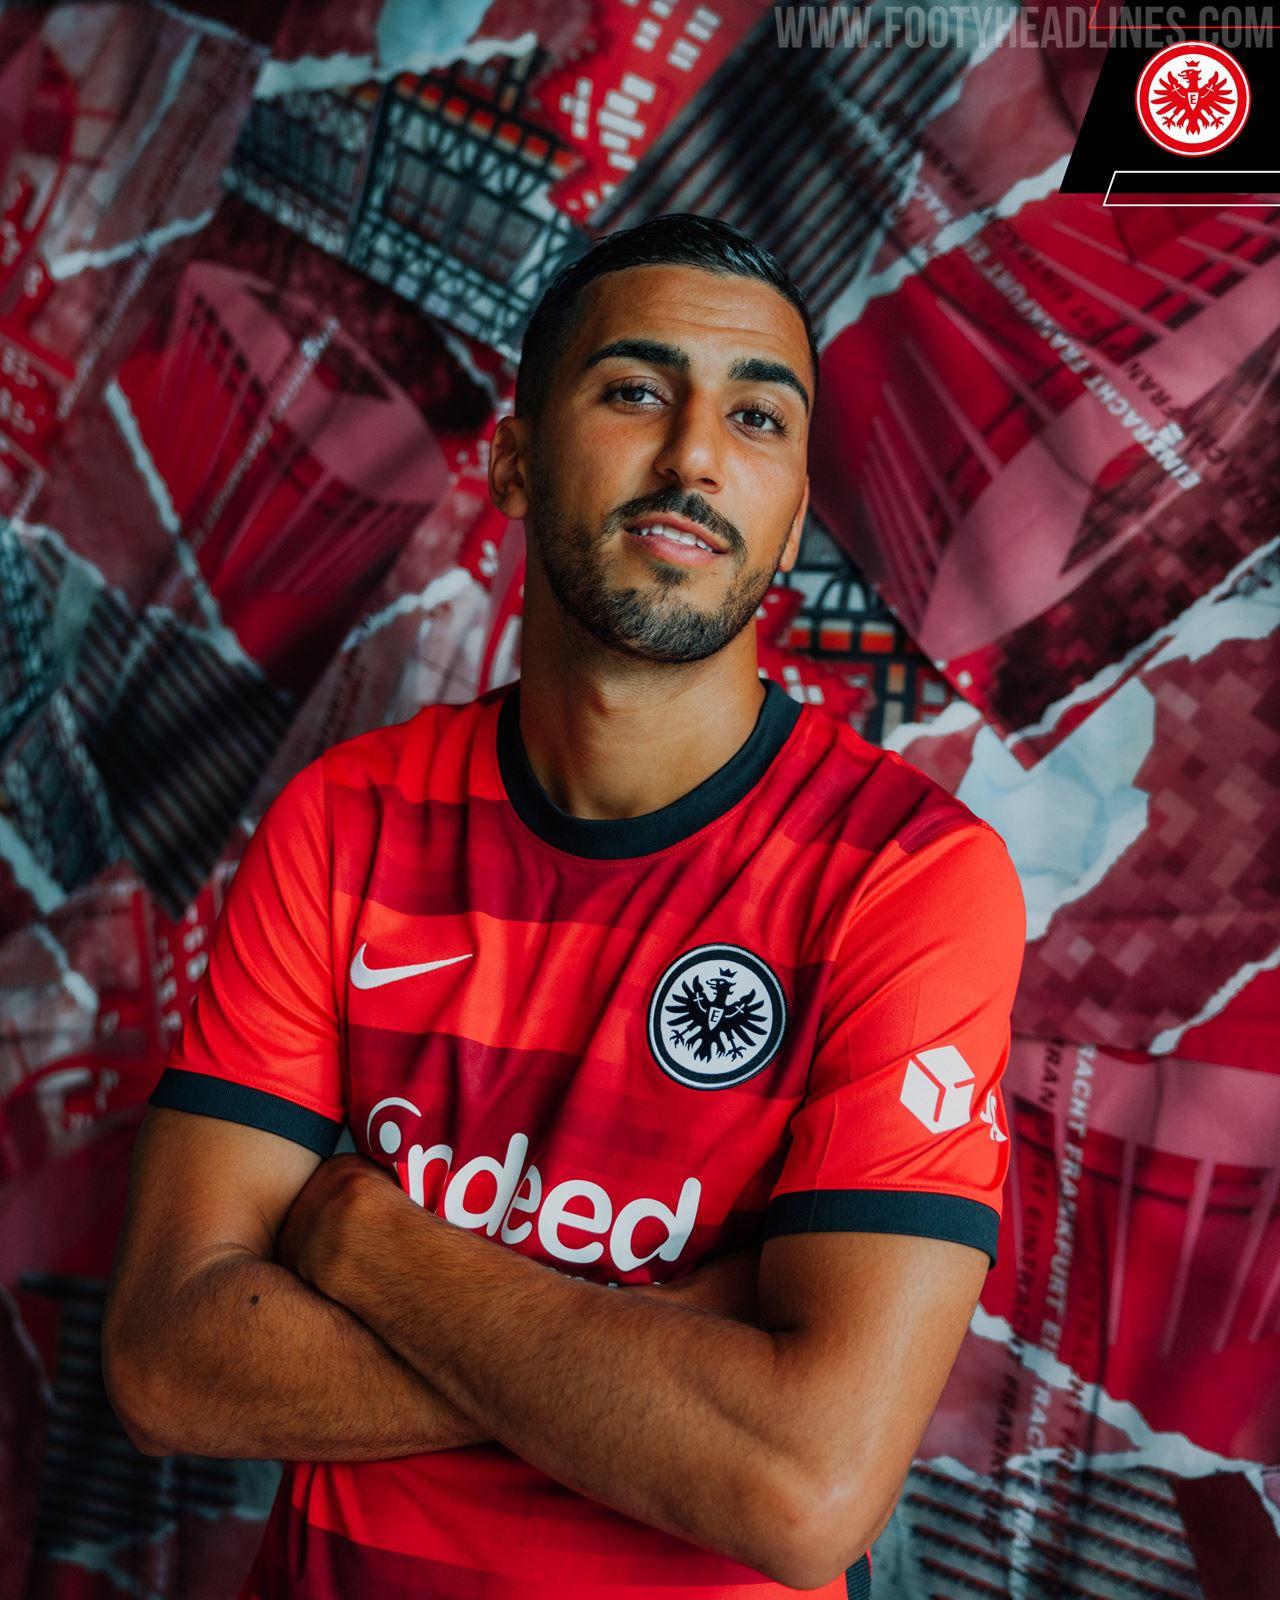 Eintracht Frankfurt 21 22 Away Kit Released   Footy Headlines